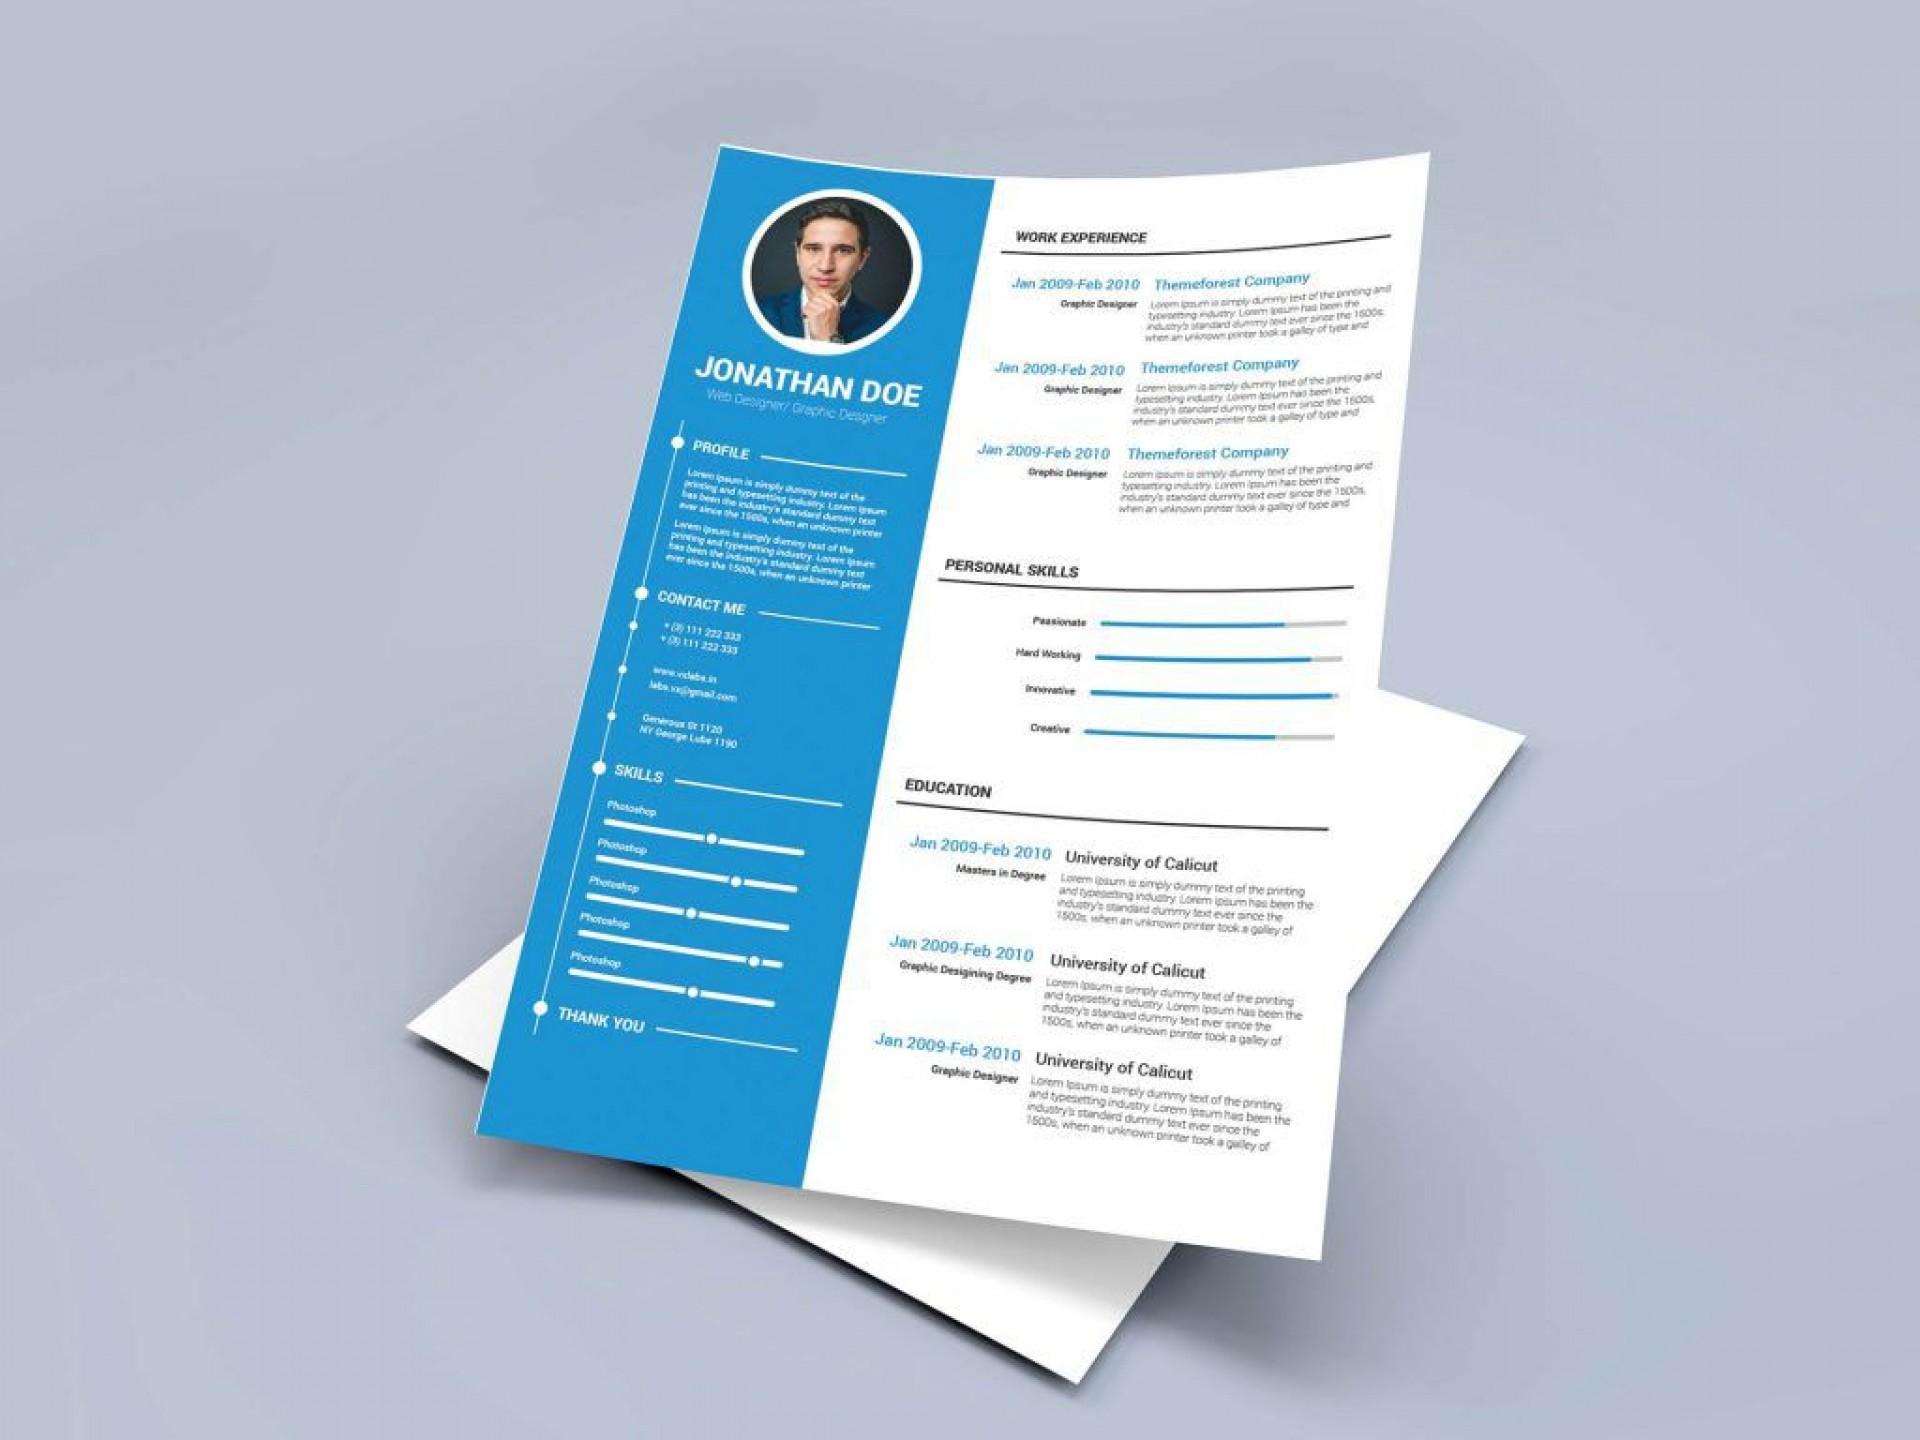 008 Marvelou Free Resume Template Microsoft Word 2010 Idea  Cv Download1920